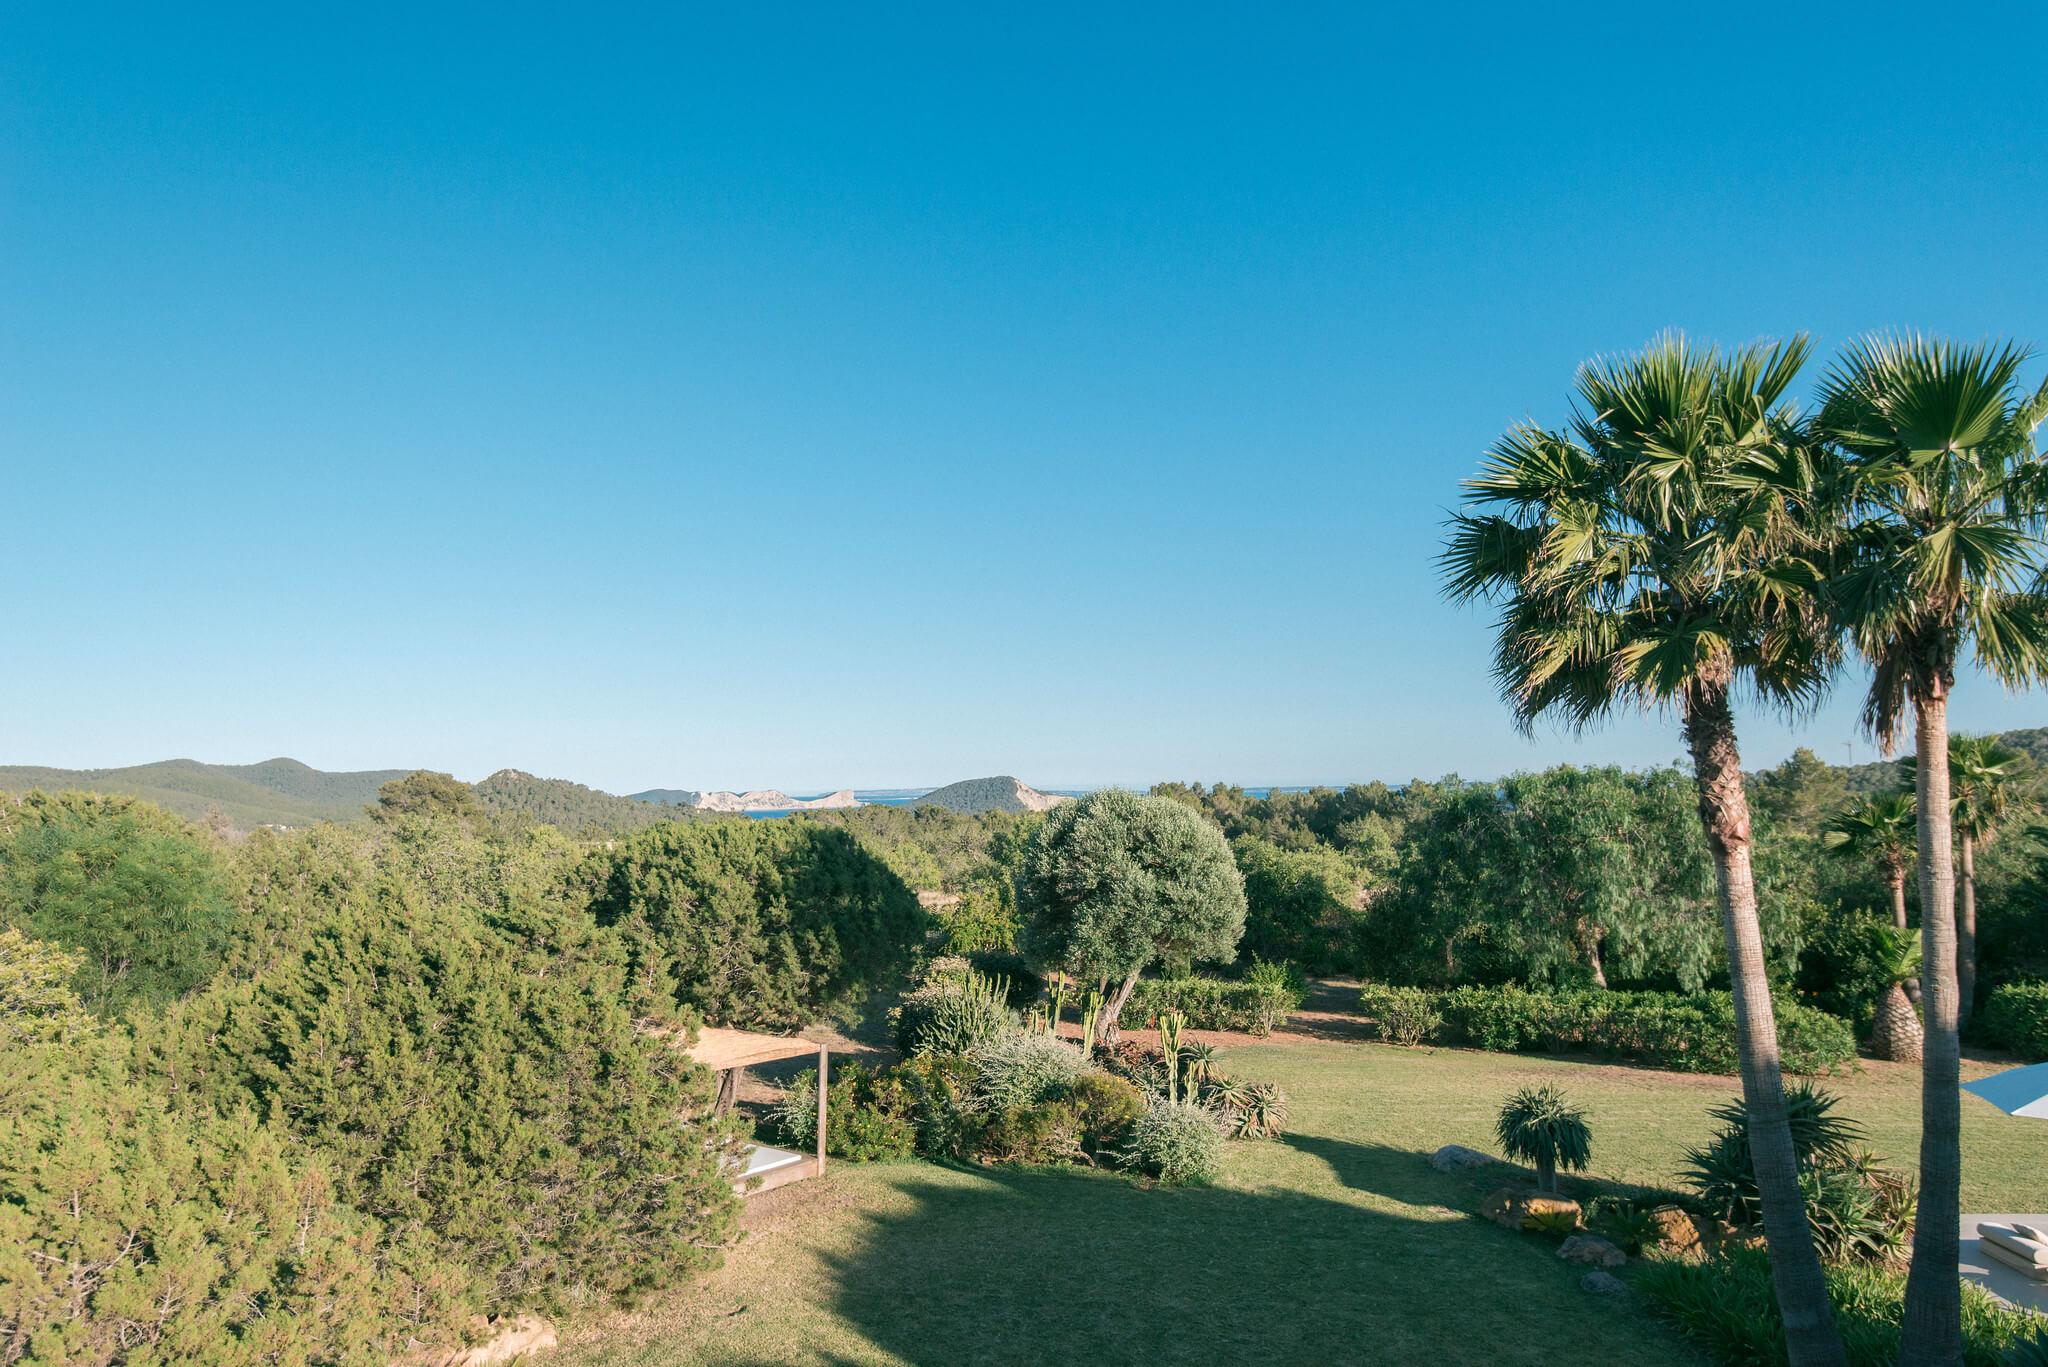 https://www.white-ibiza.com/wp-content/uploads/2020/06/white-ibiza-villas-casa-odette-exterior-view.jpg